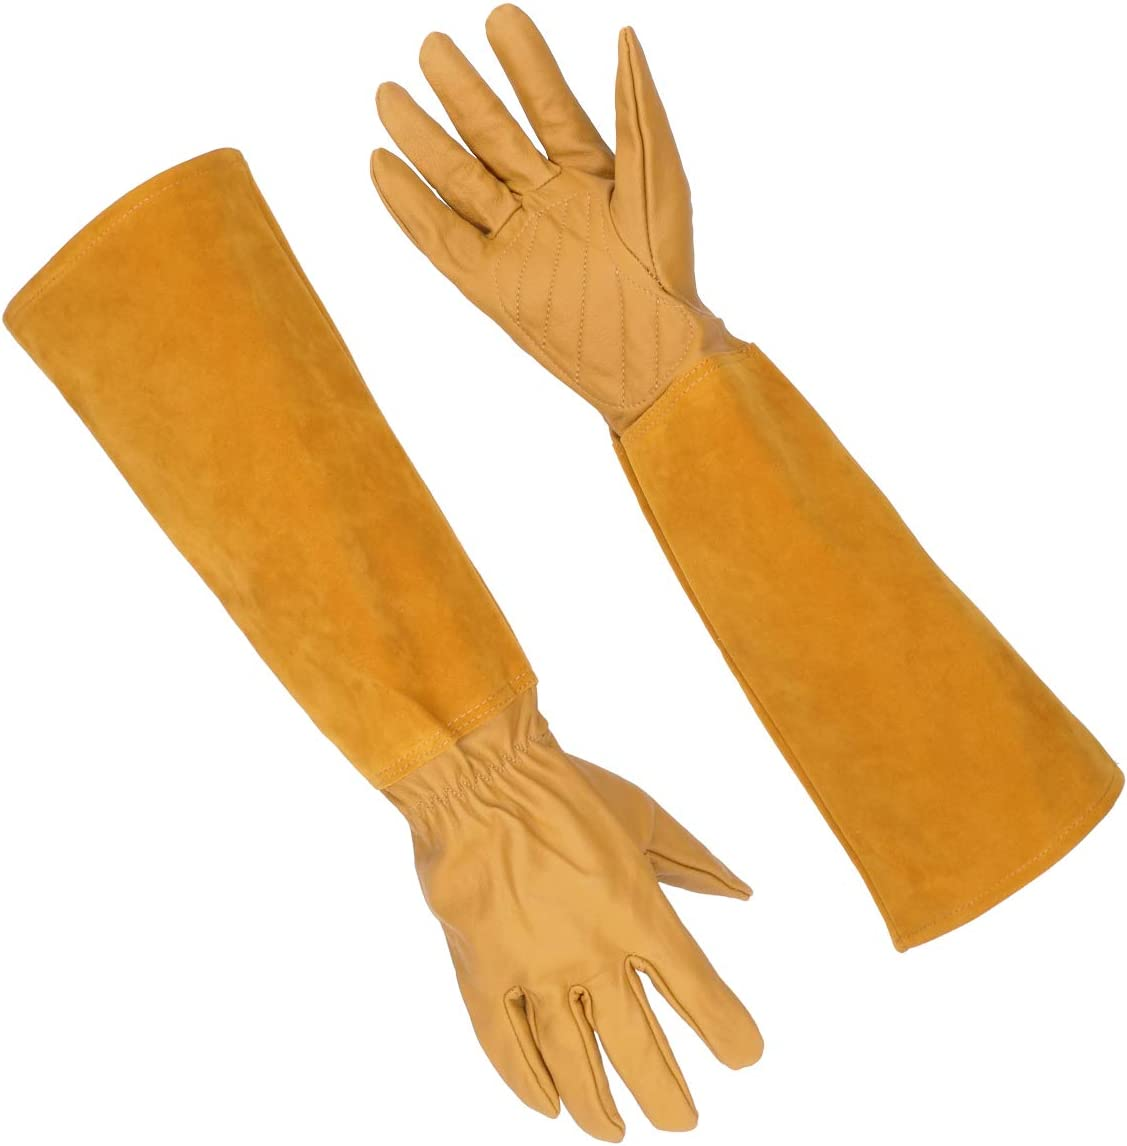 Gardening Gloves for Men and Women, Katfort Rose Pruning Gloves with Long Forearm Protection Garden Gloves Thorn Resistant (Medium)